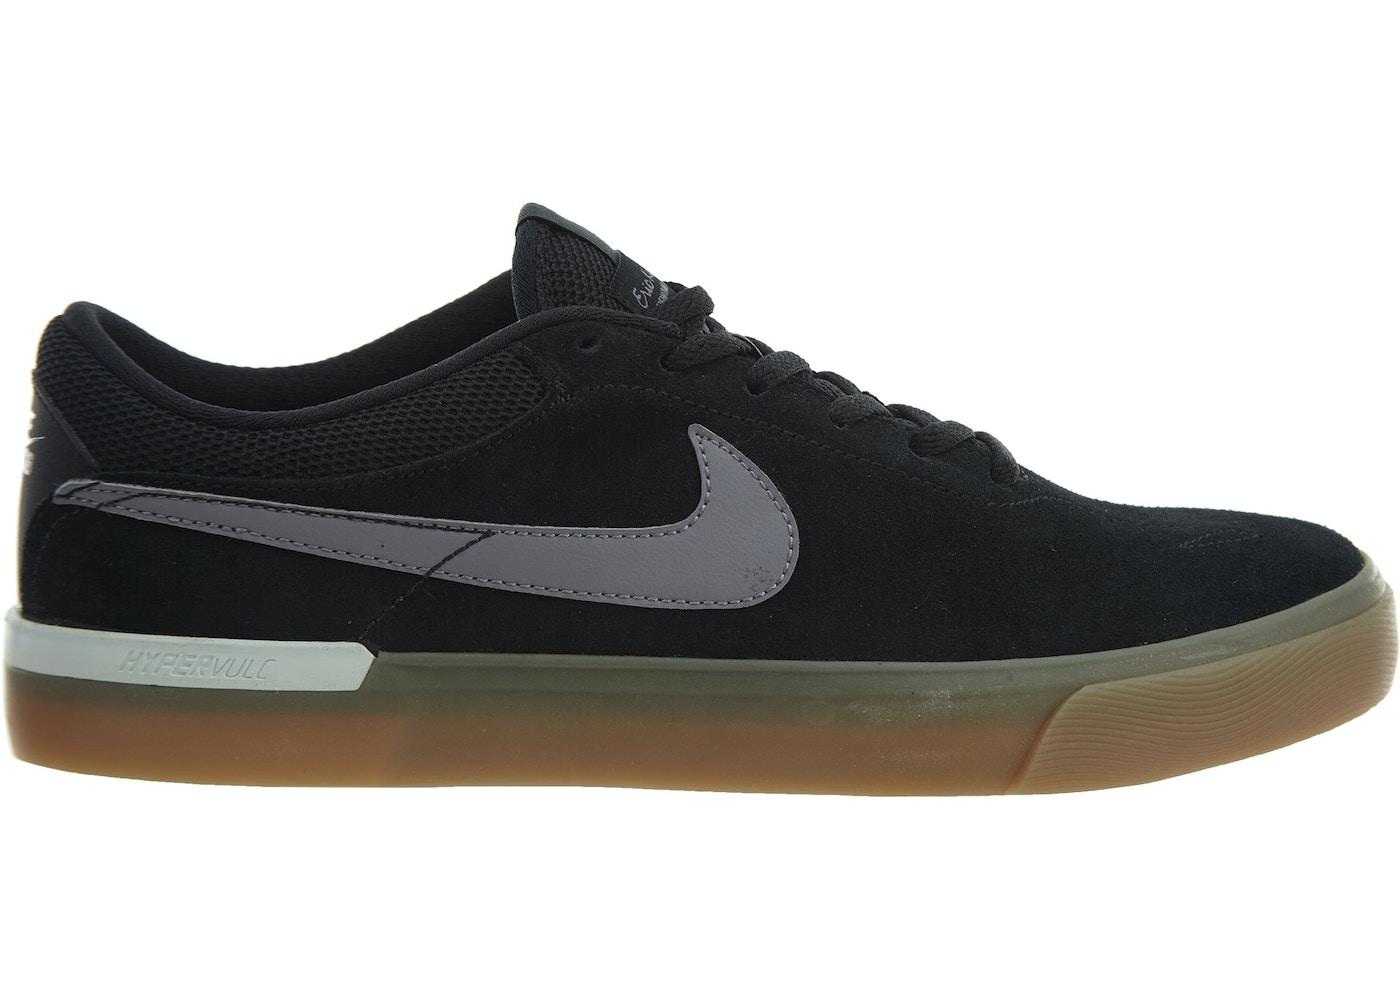 89ce3179feac Nike Sb Koston Hypervulc Black Gunsmoke-Vast Grey-White - 844447-006